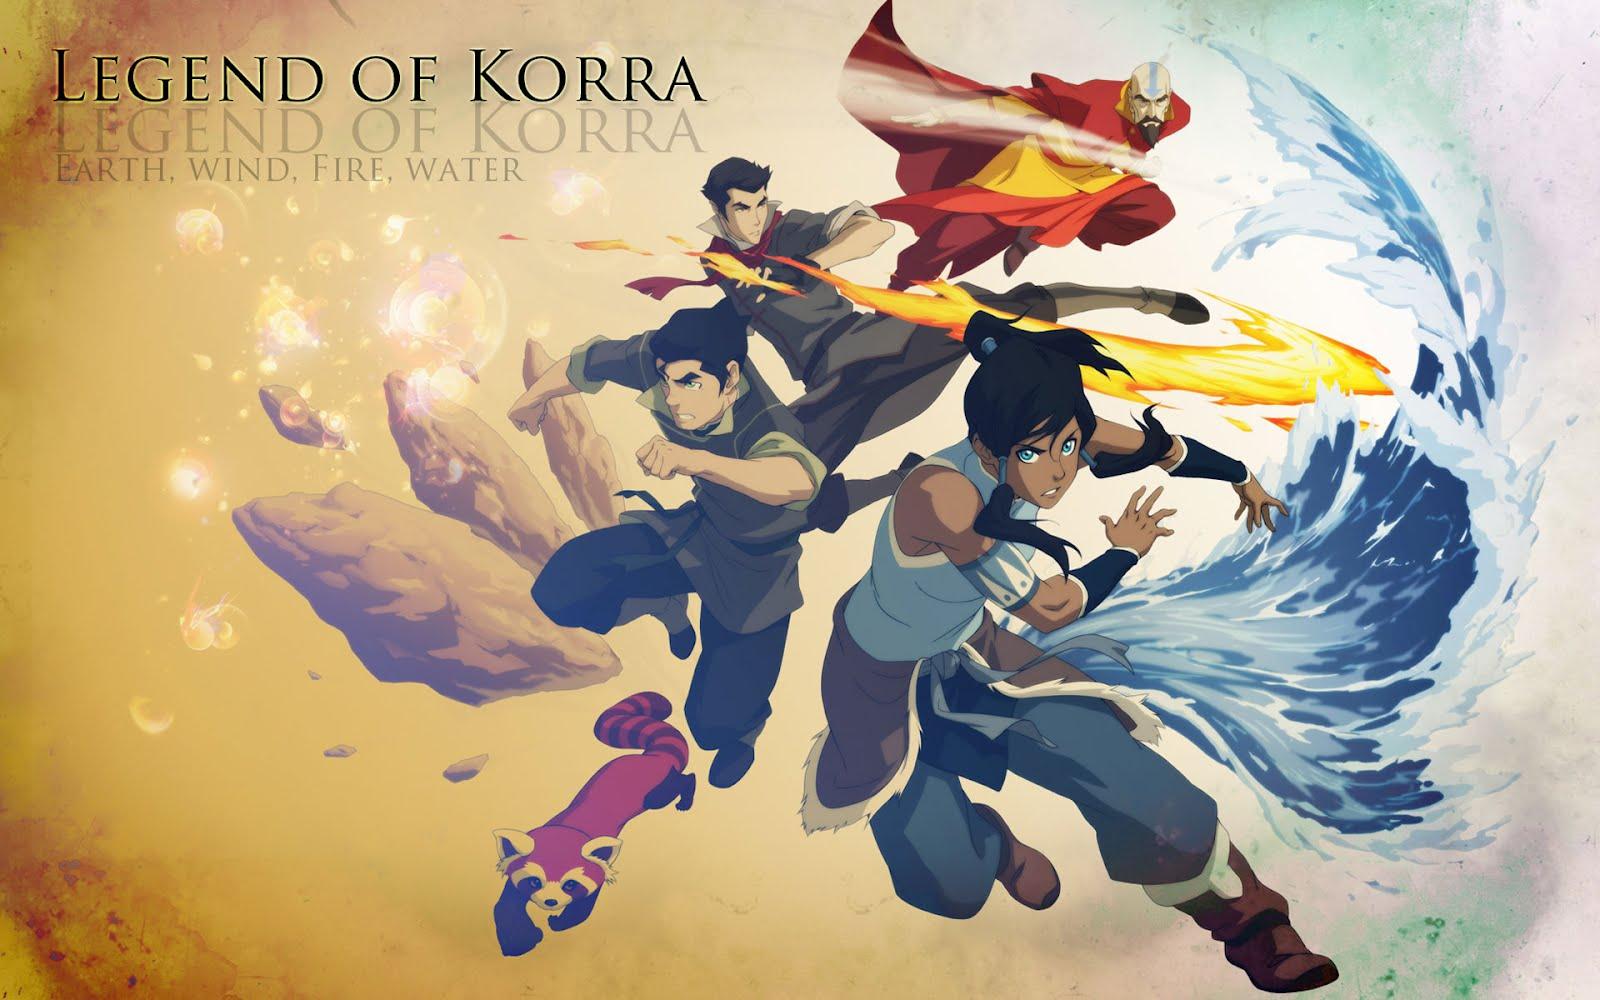 HD wallpapers legend of korra iphone wallpaper tumblr